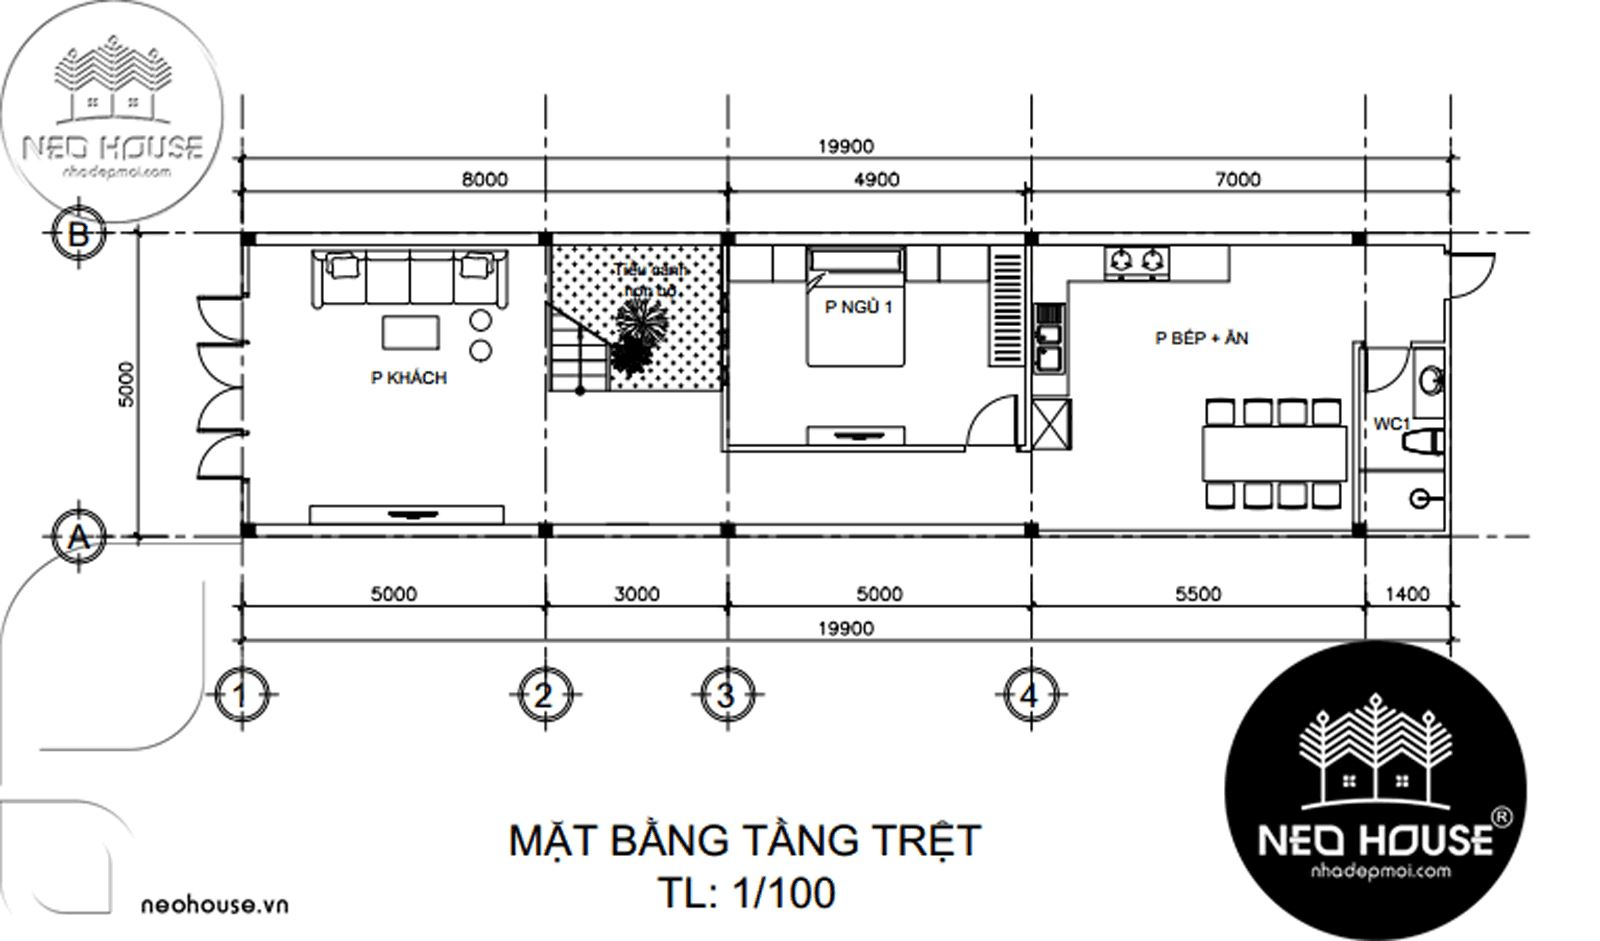 Nha-Pho-Co-Dien-3-tang-kieu-phap-NPC01